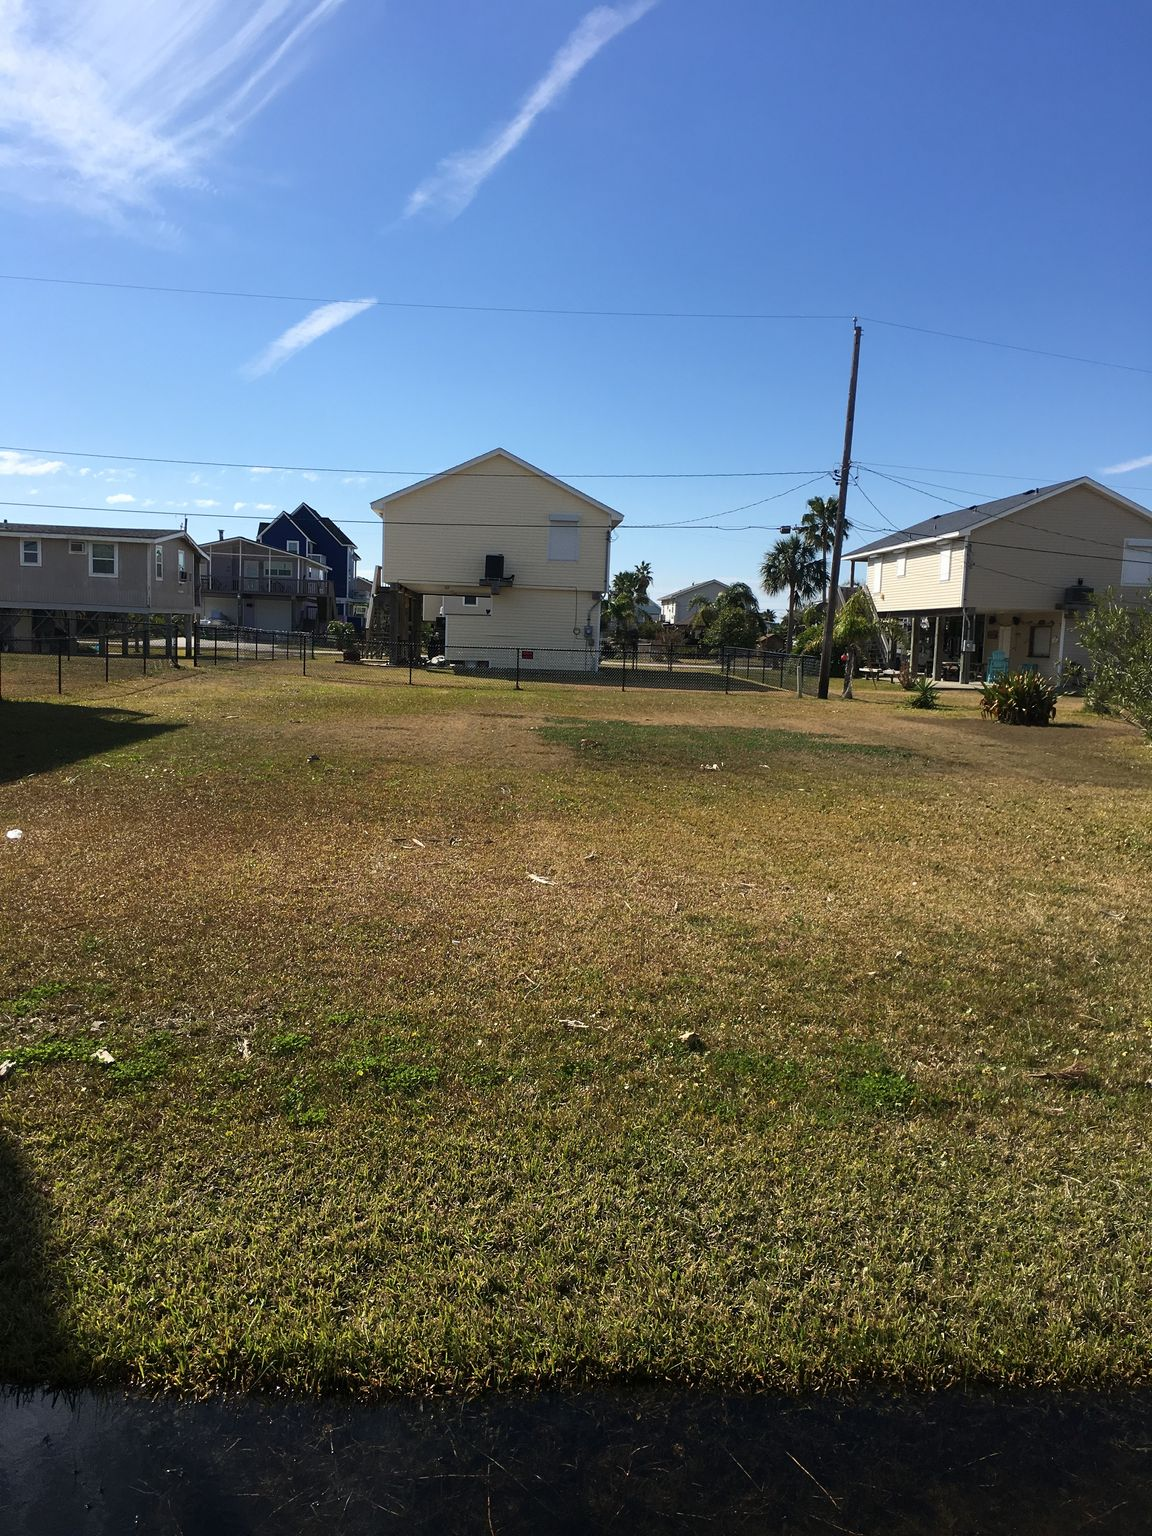 San Jacinto 626 #626, Galveston, TX 77554 | Trulia